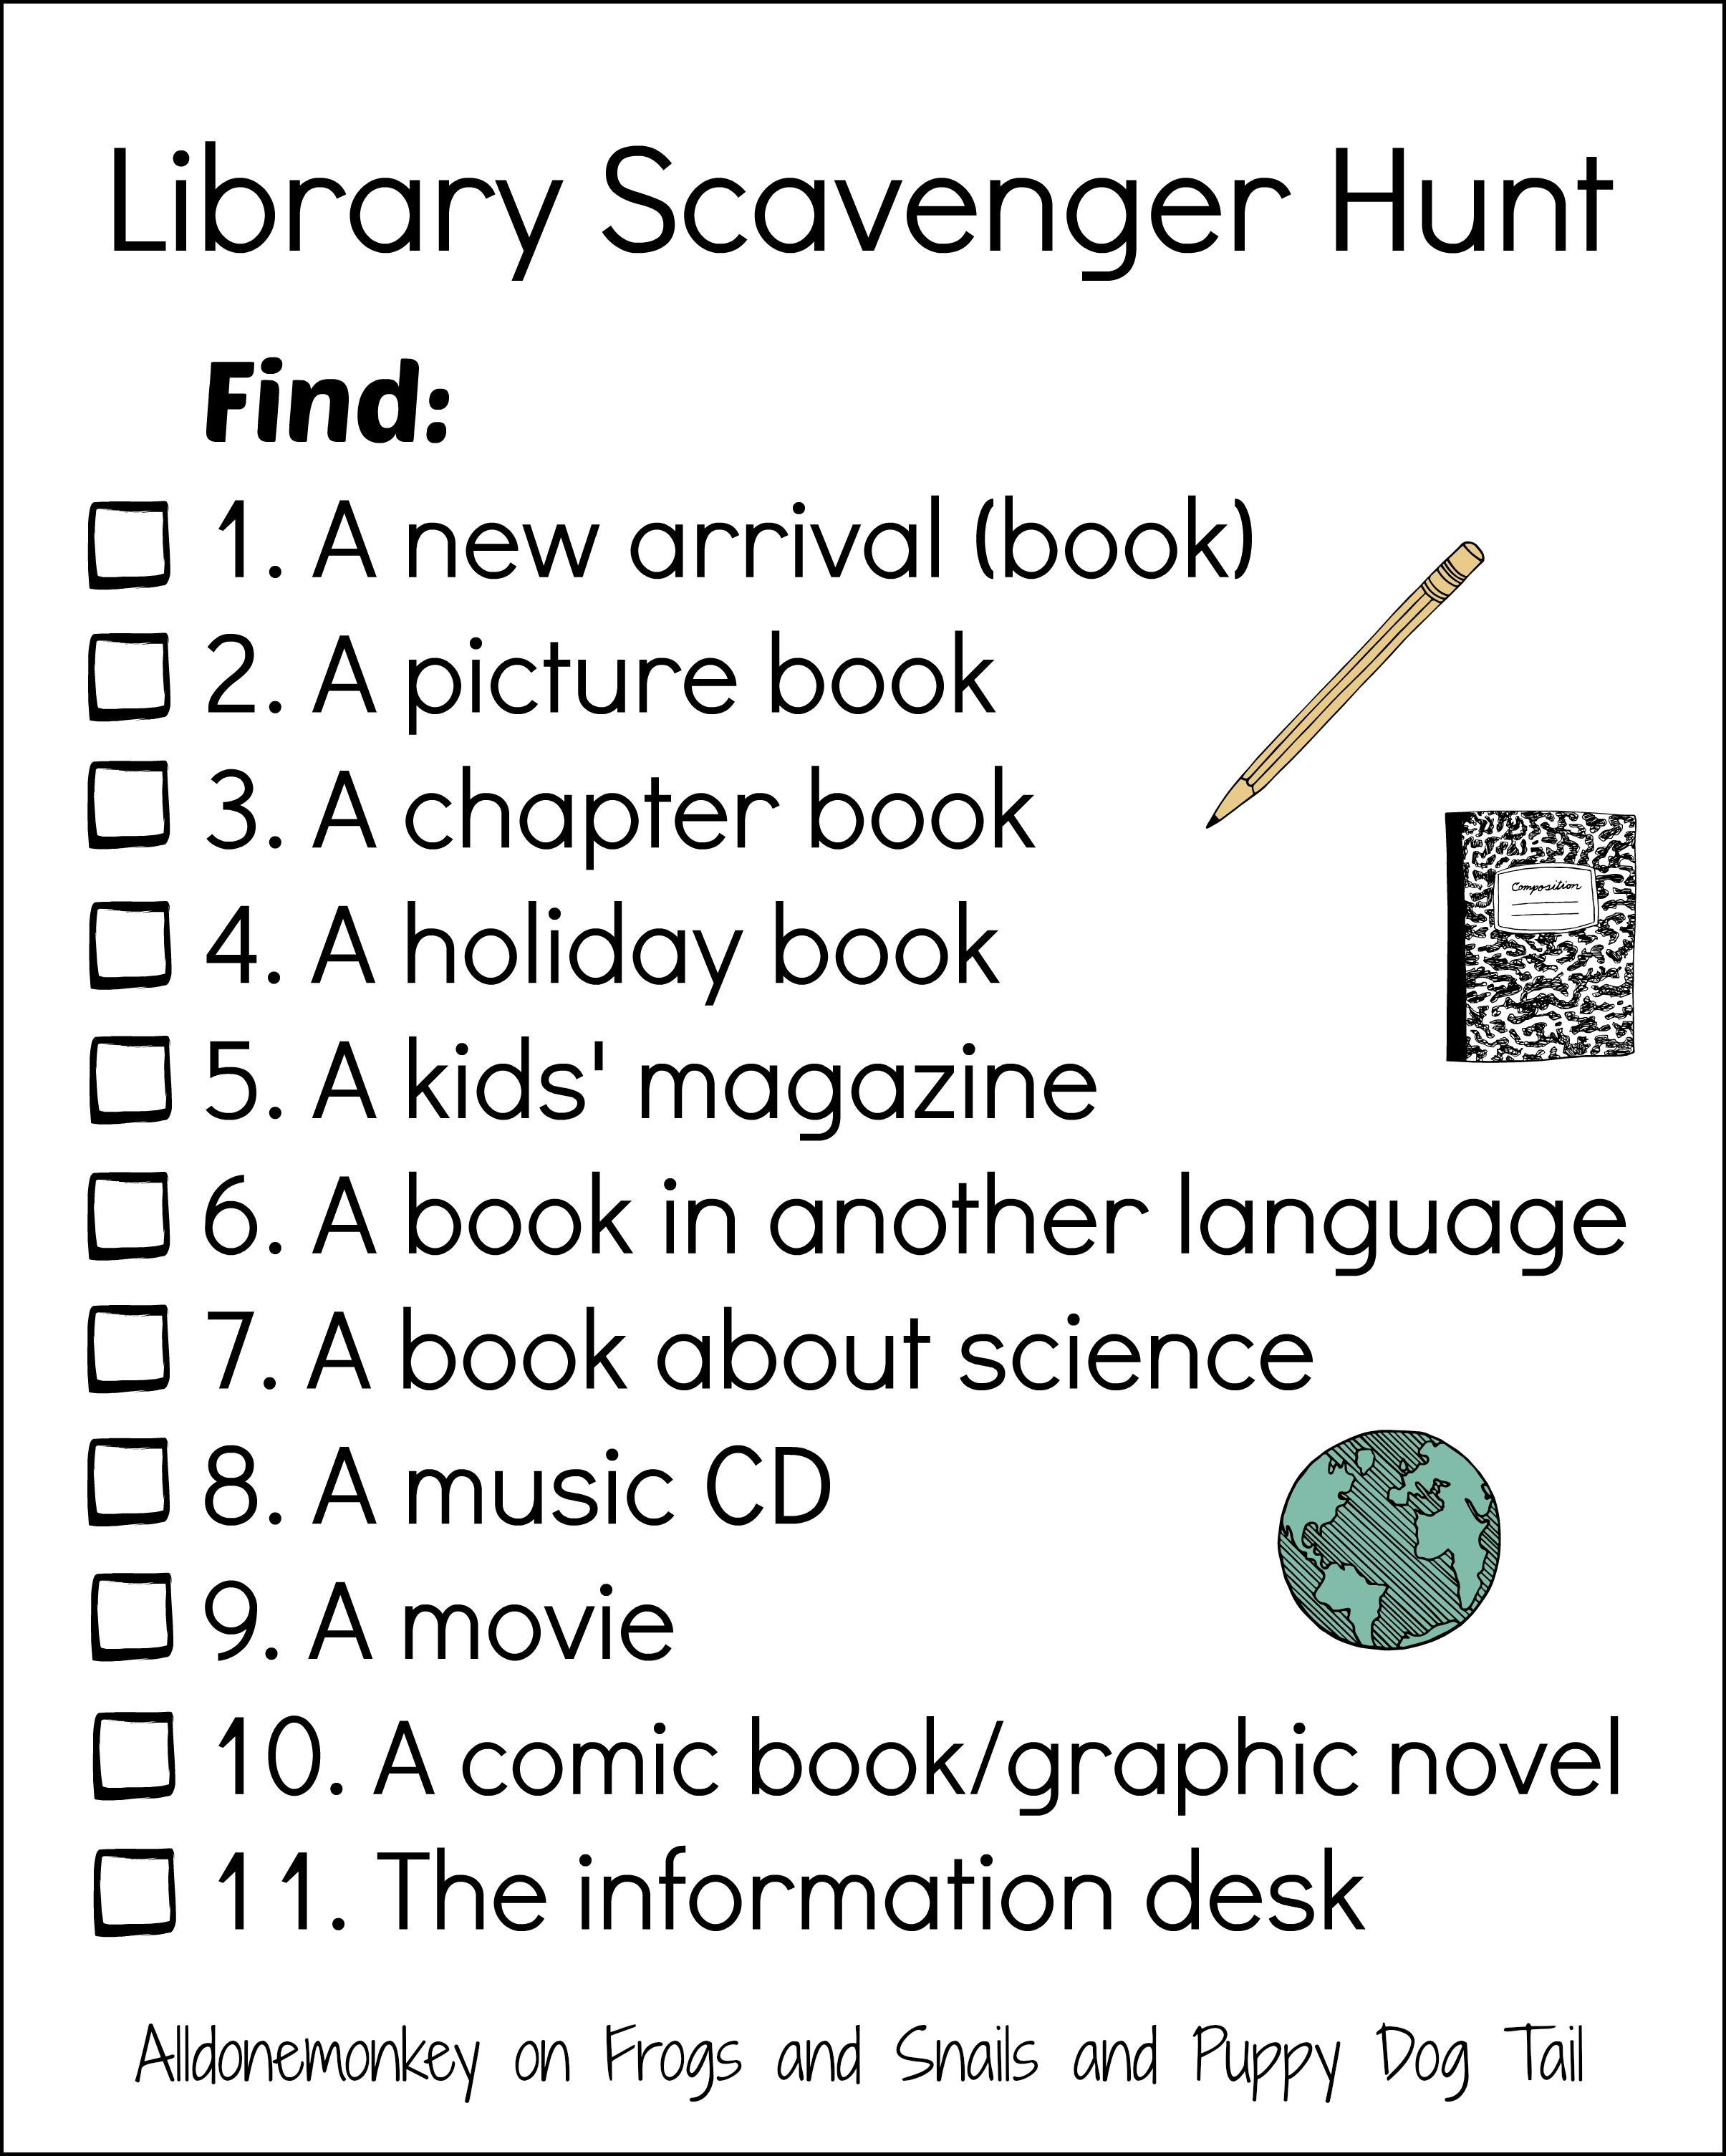 library scavenger hunt fspdt